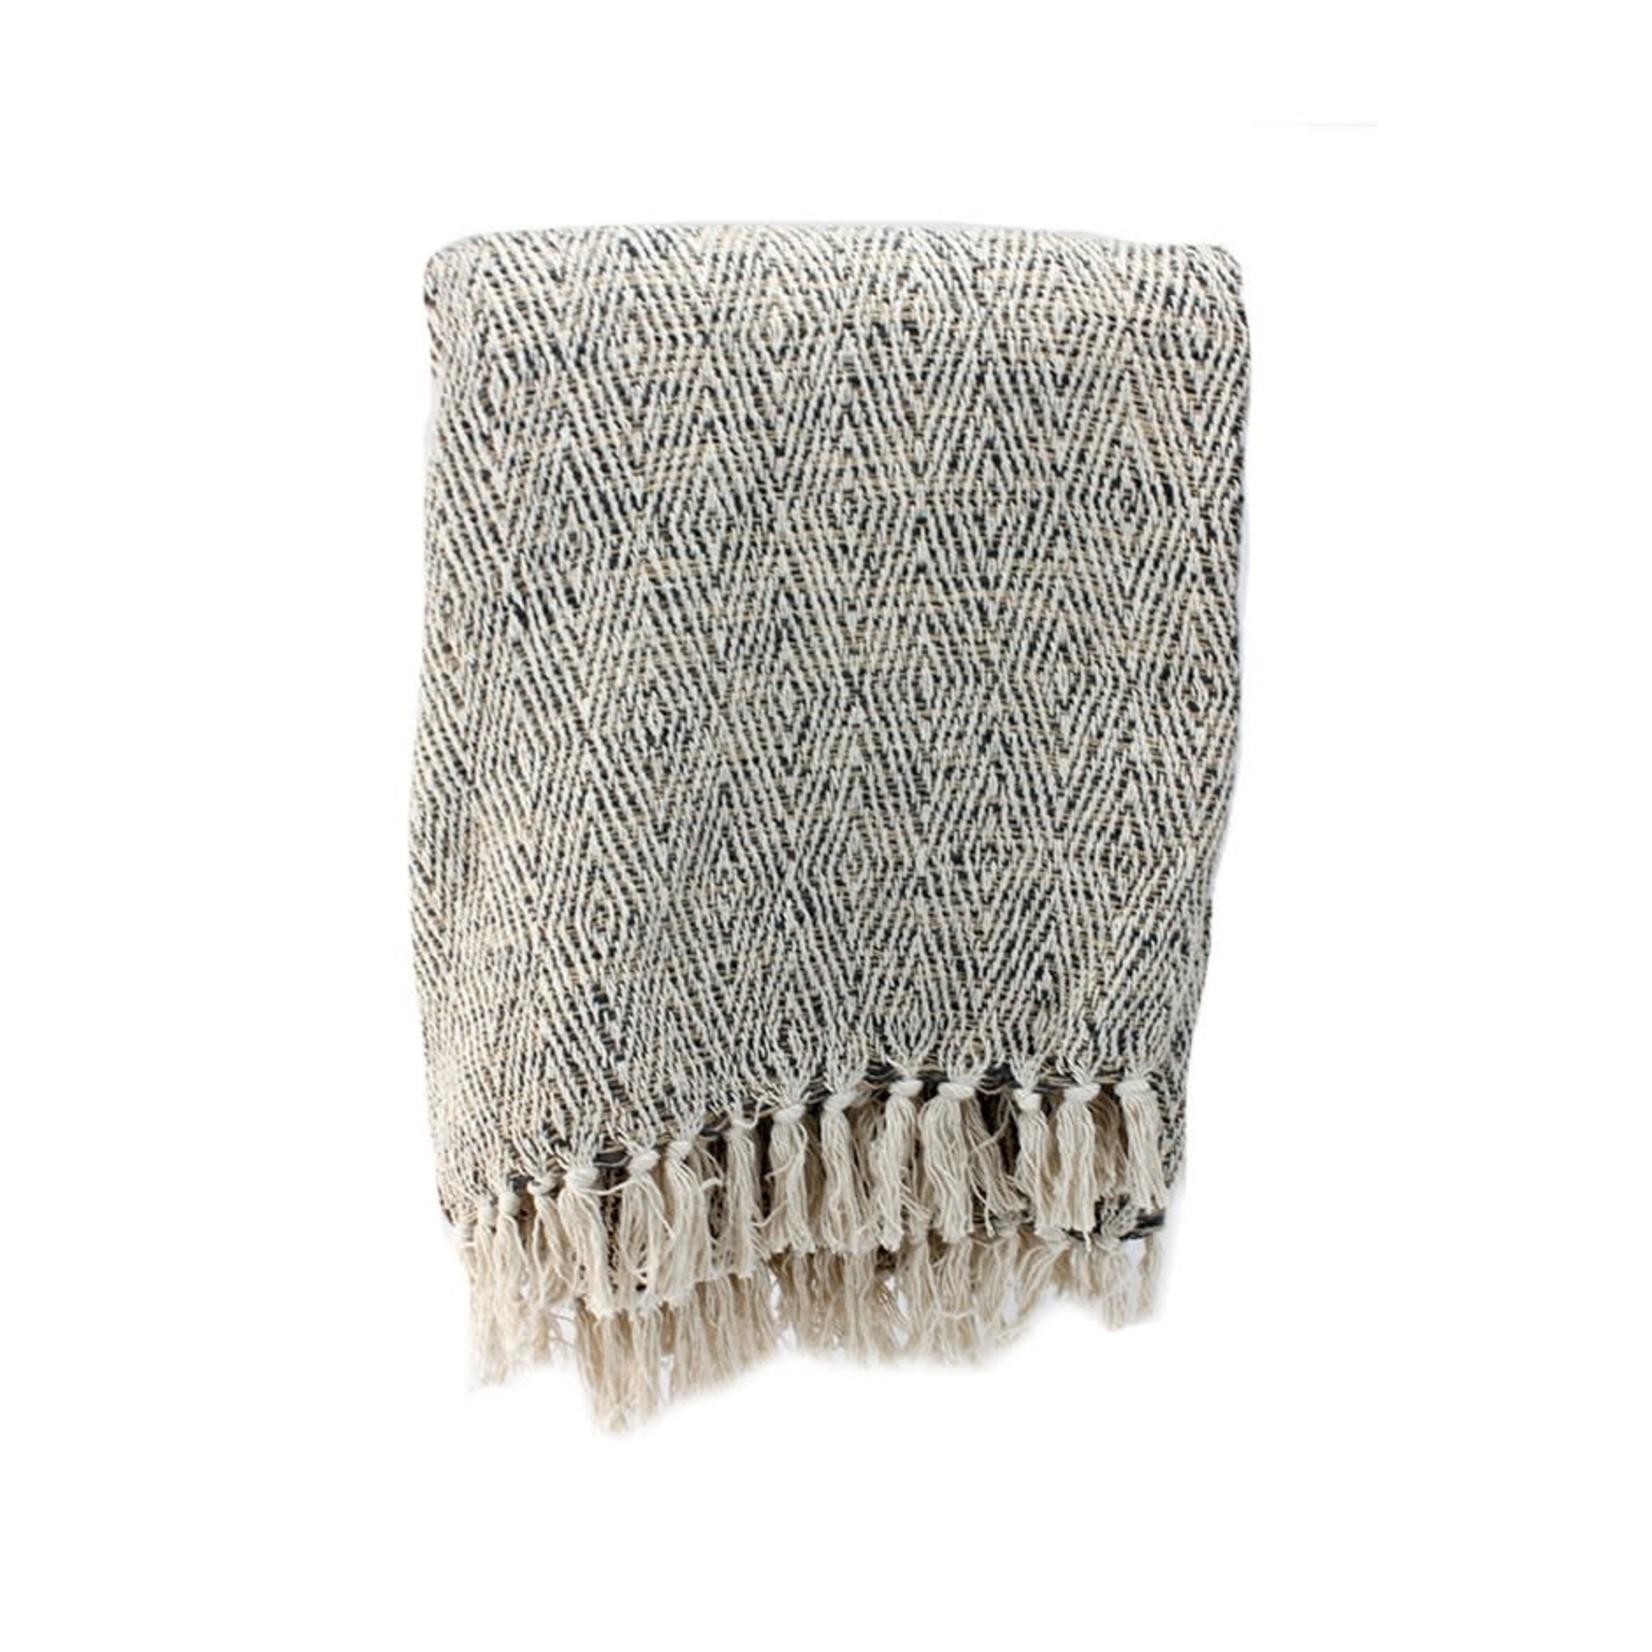 Throw Blanket - Grey